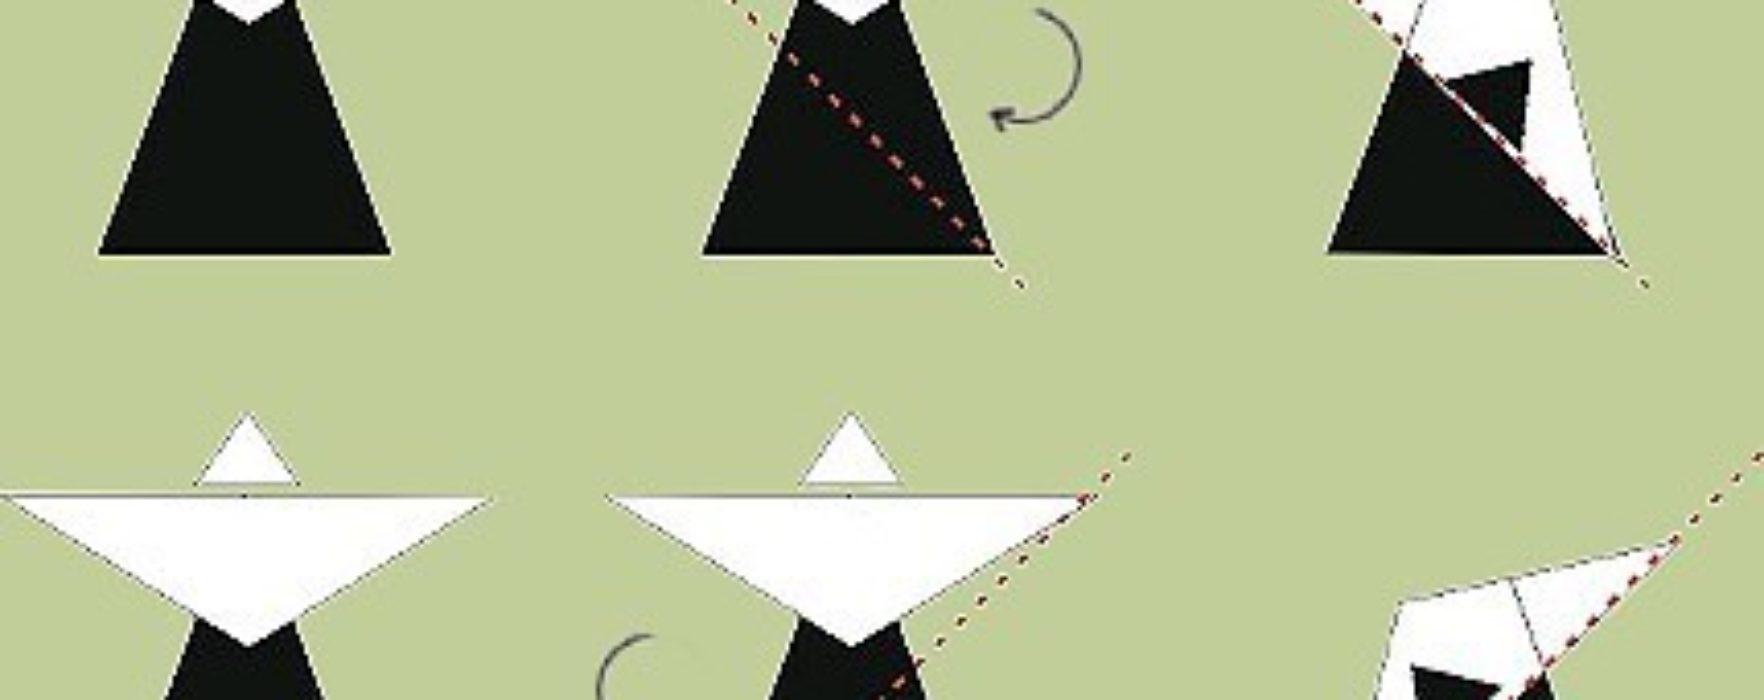 OriAiki-Do, ovvero Origami ed Aikido